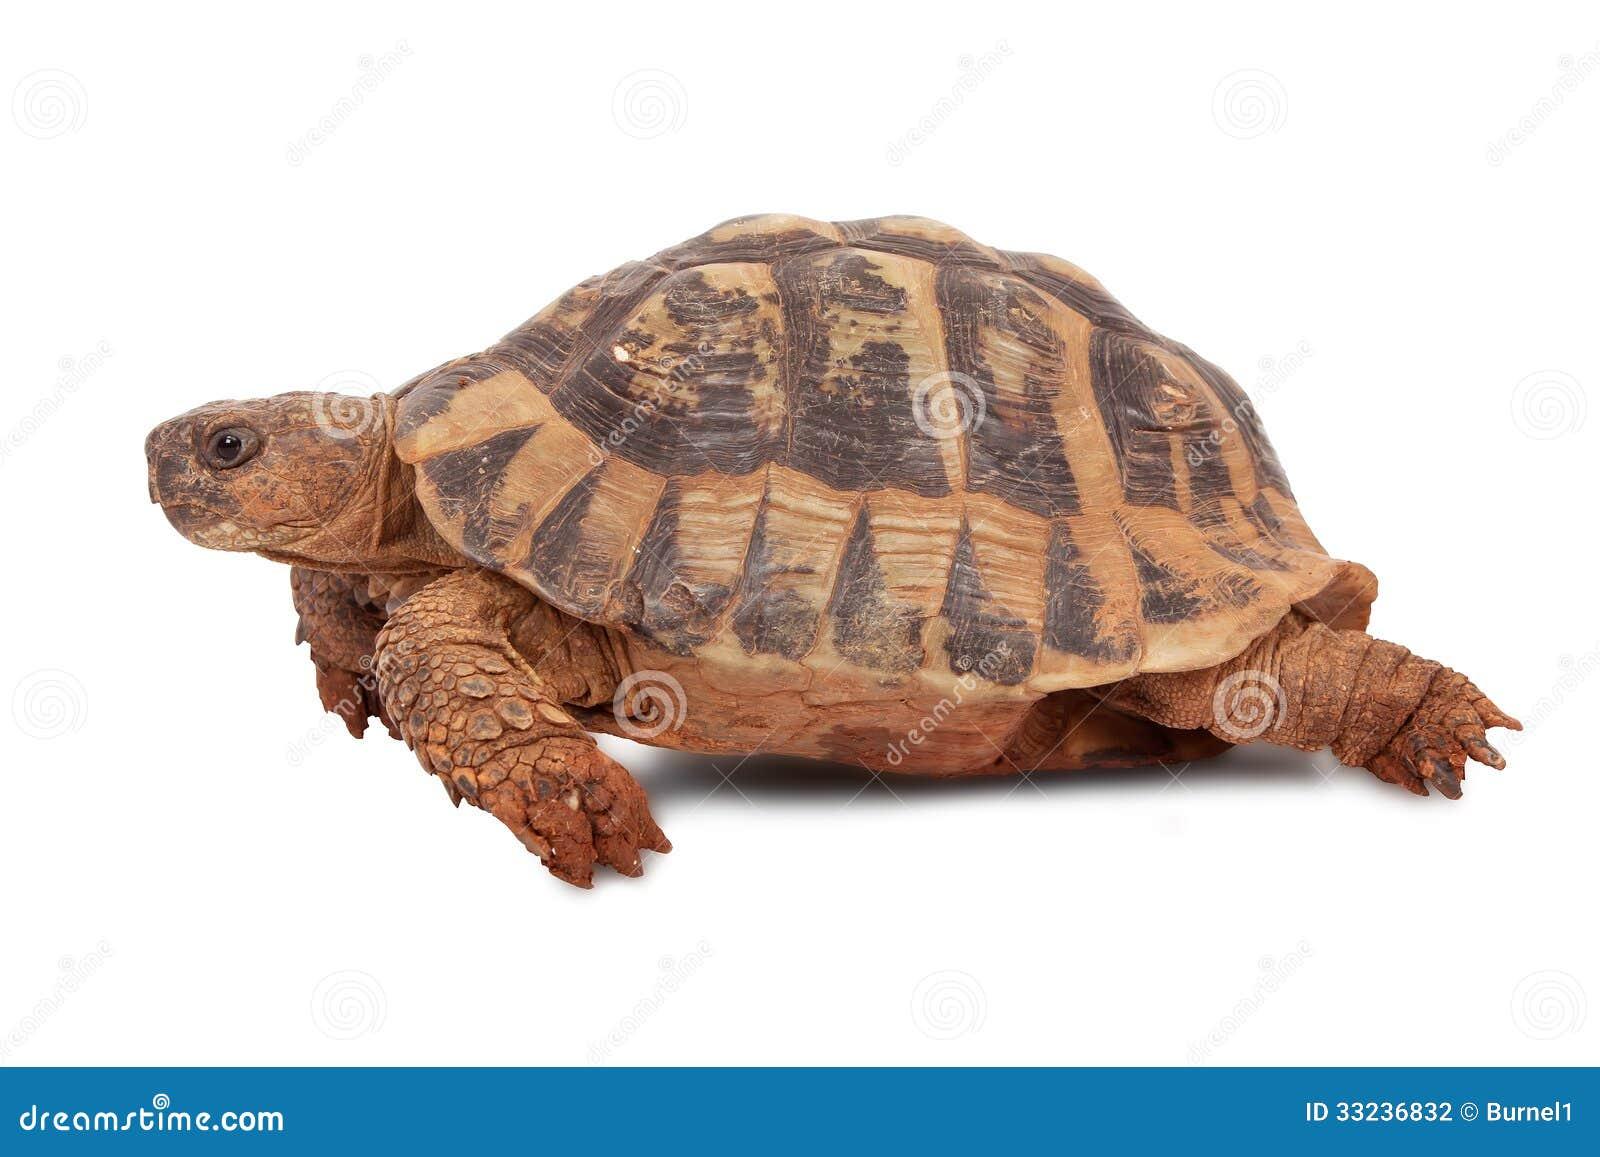 turtle stock photography image 33236832